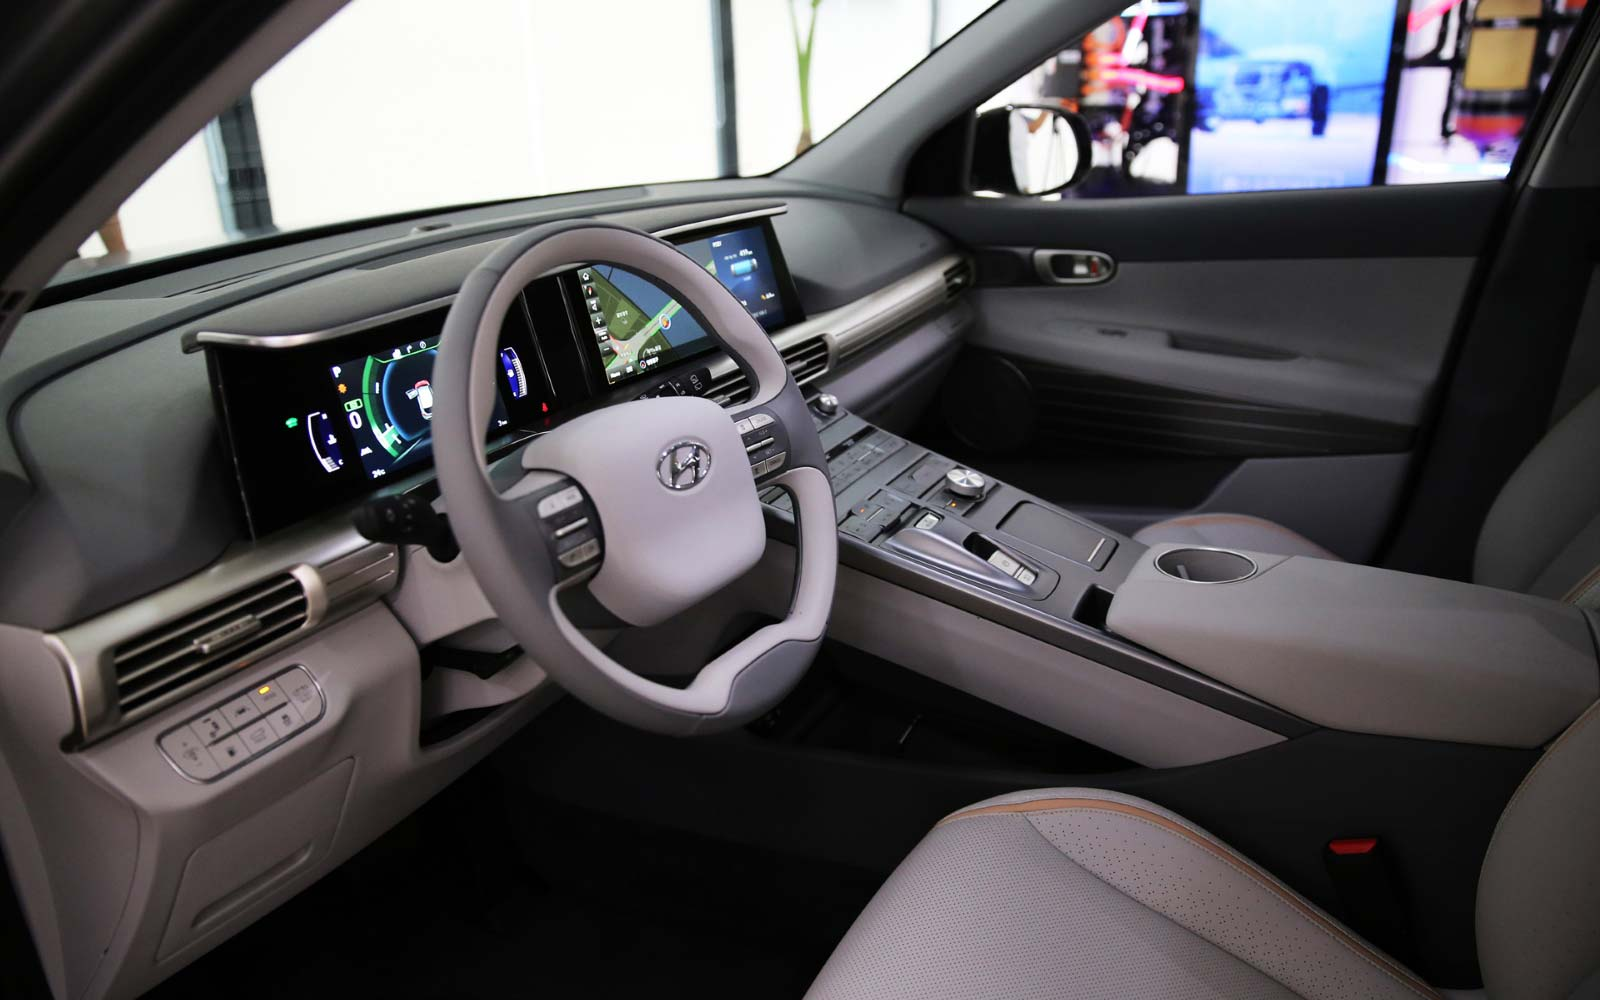 2017-hyundai-next-gen-fuel-cell-suv-interior